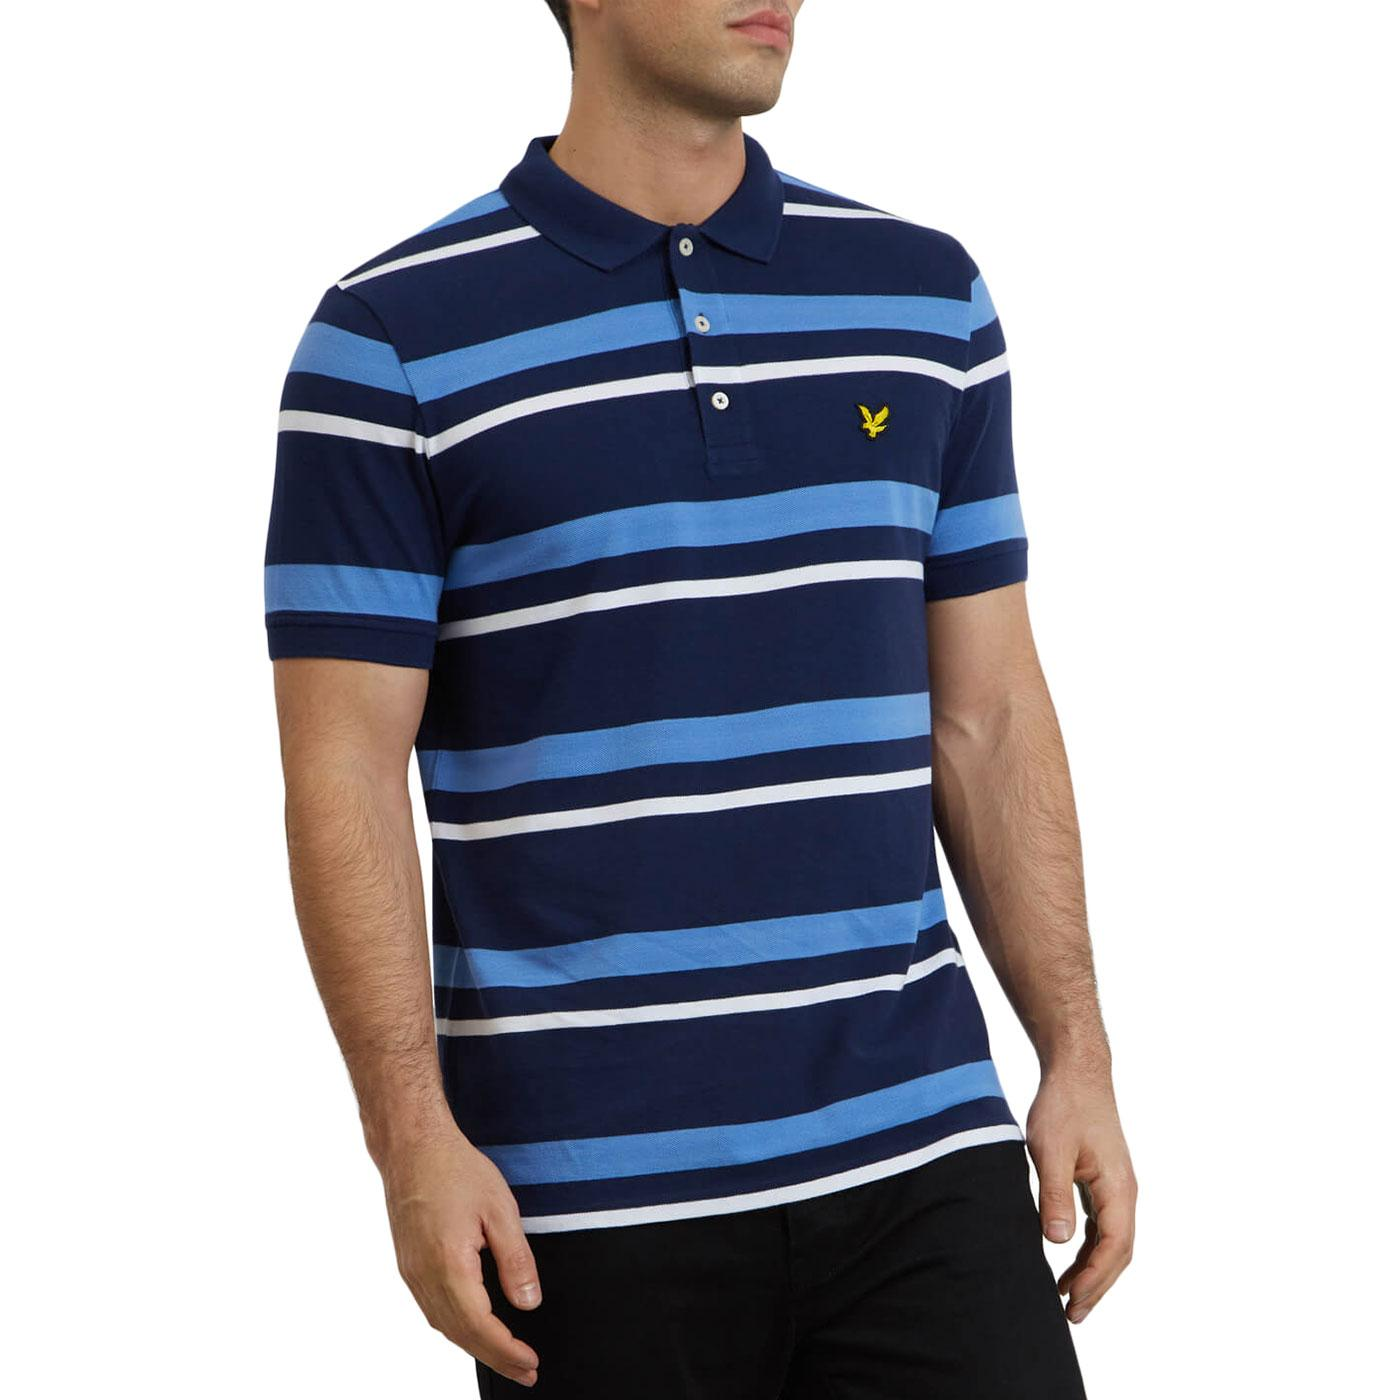 LYLE & SCOTT Retro Mod Stripe Pique Polo Shirt (N)